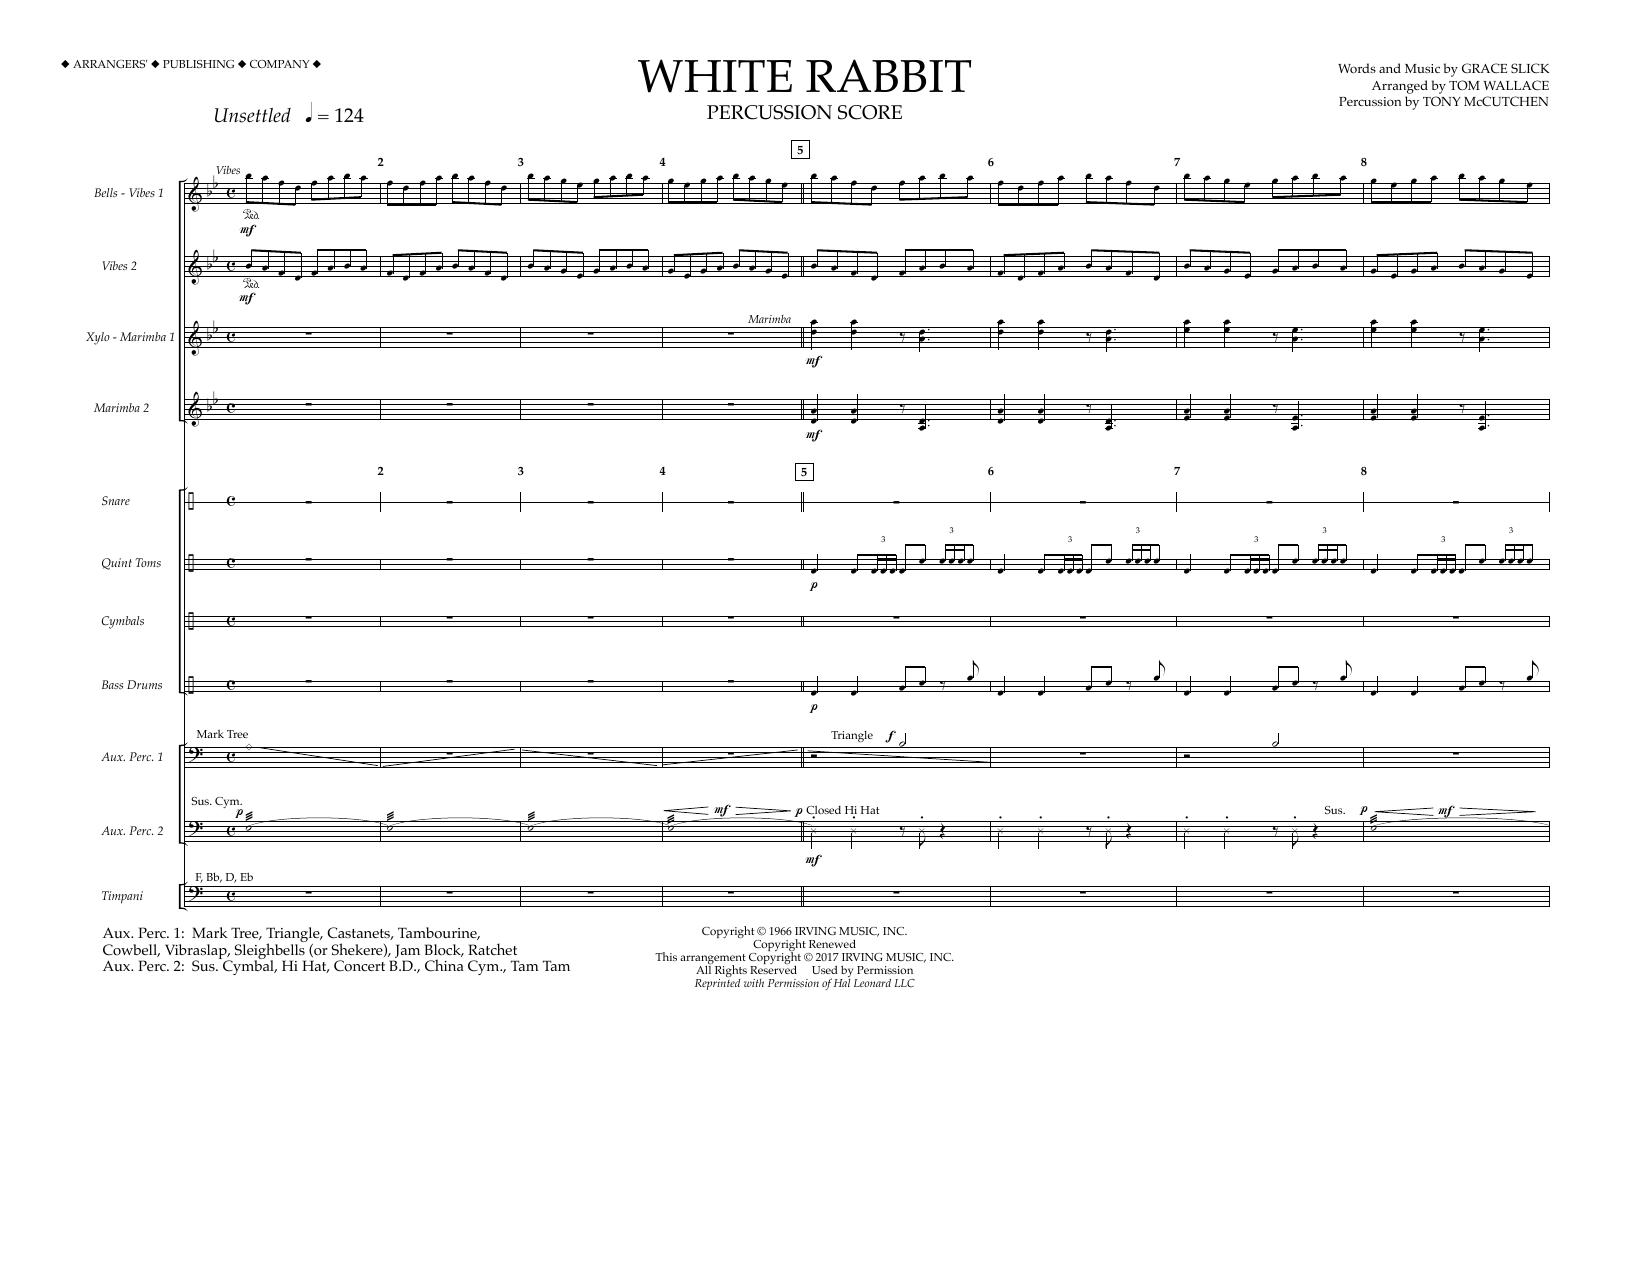 White Rabbit - Percussion Score Sheet Music